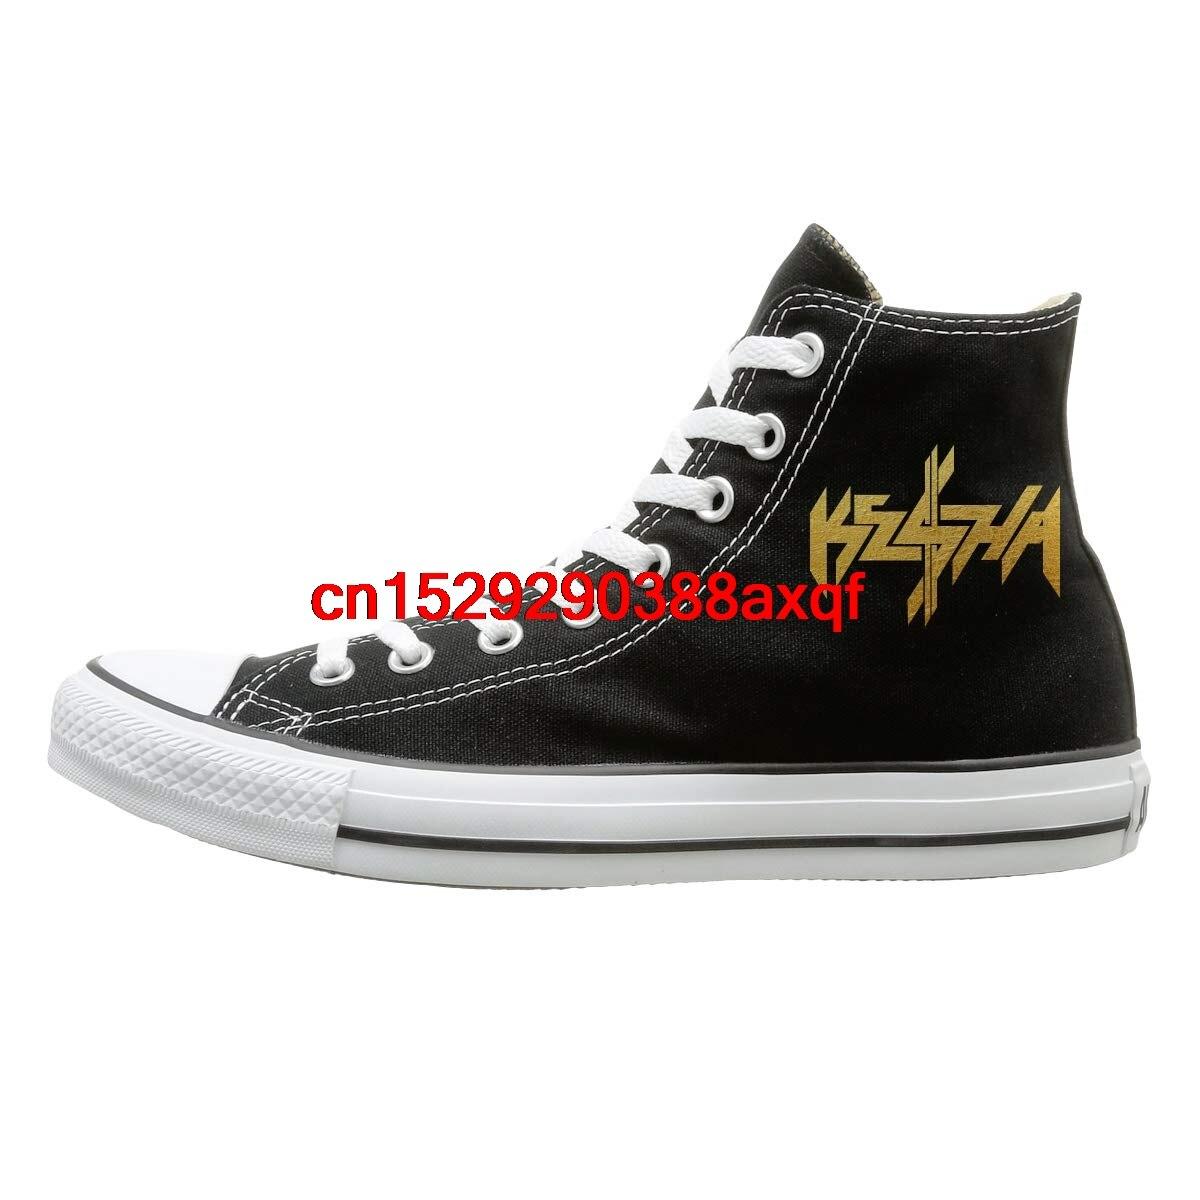 Women Men Sneakers  Teenagers Boys and Girls Sports Shoes Casual Shoes Unisex Ke$ha Kesha High-top Sneakers Canvas Shoes